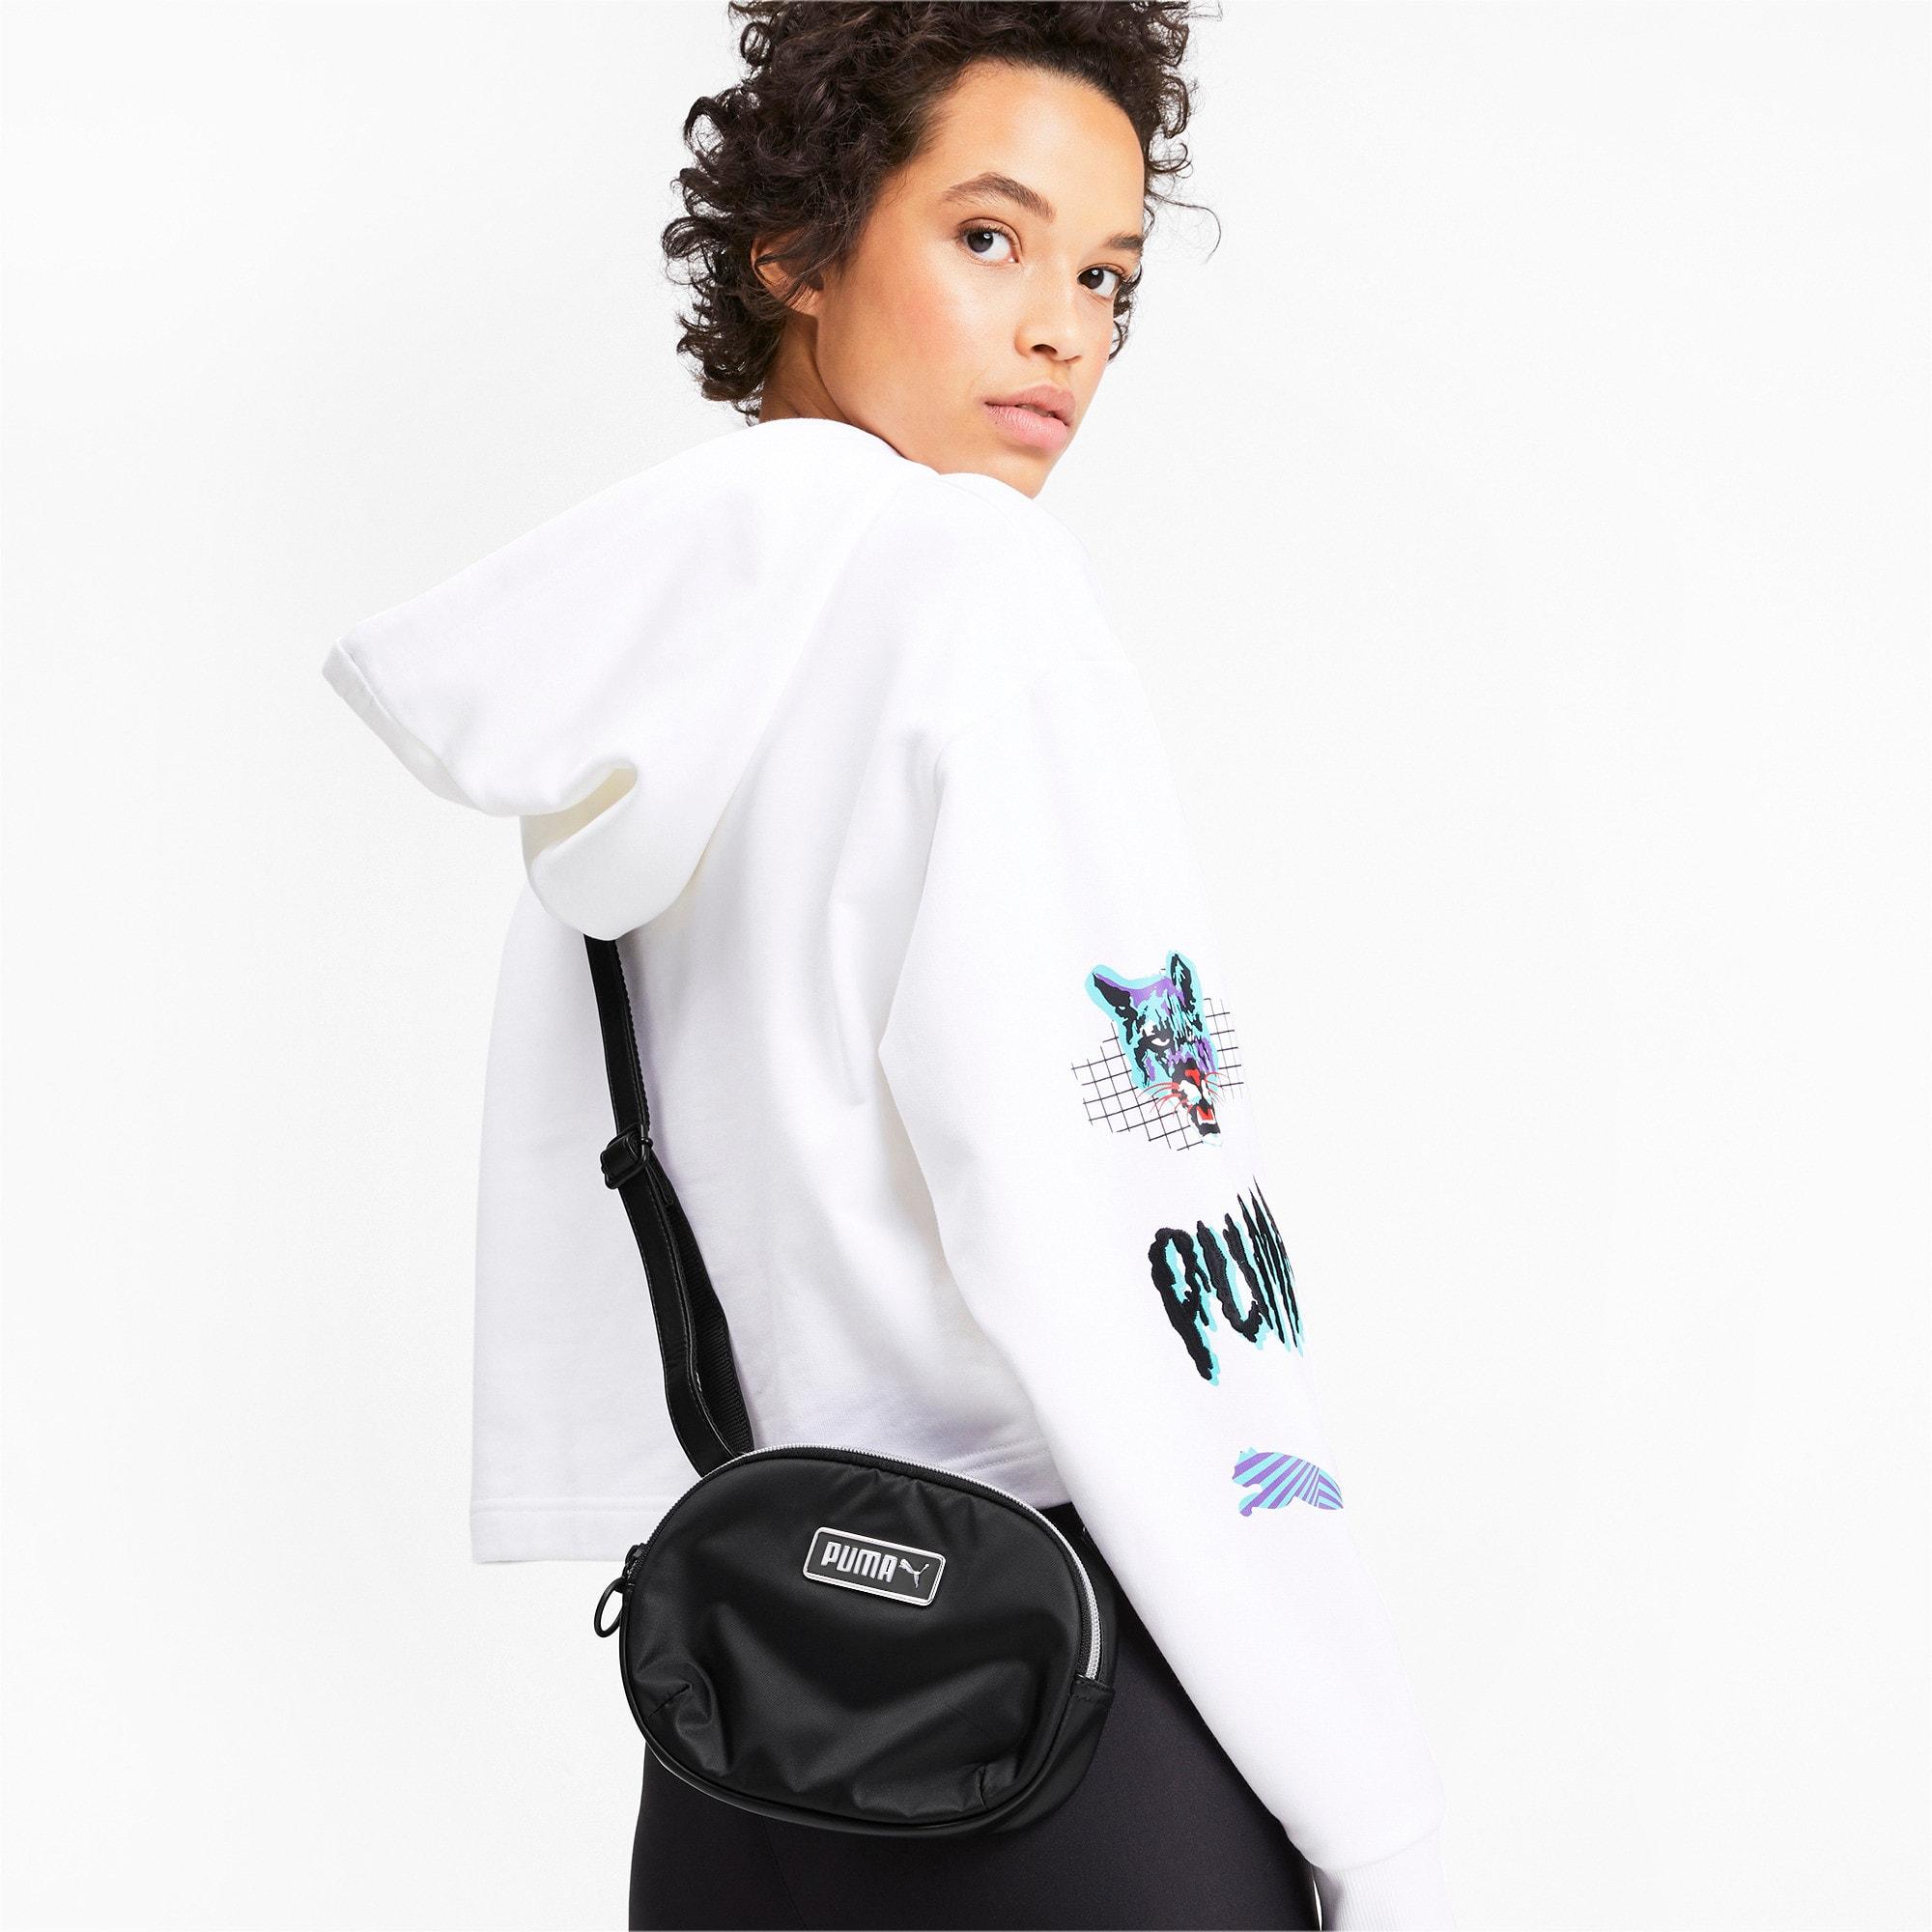 Thumbnail 2 of Classics Women's X-Body Bag, Puma Black, medium-IND